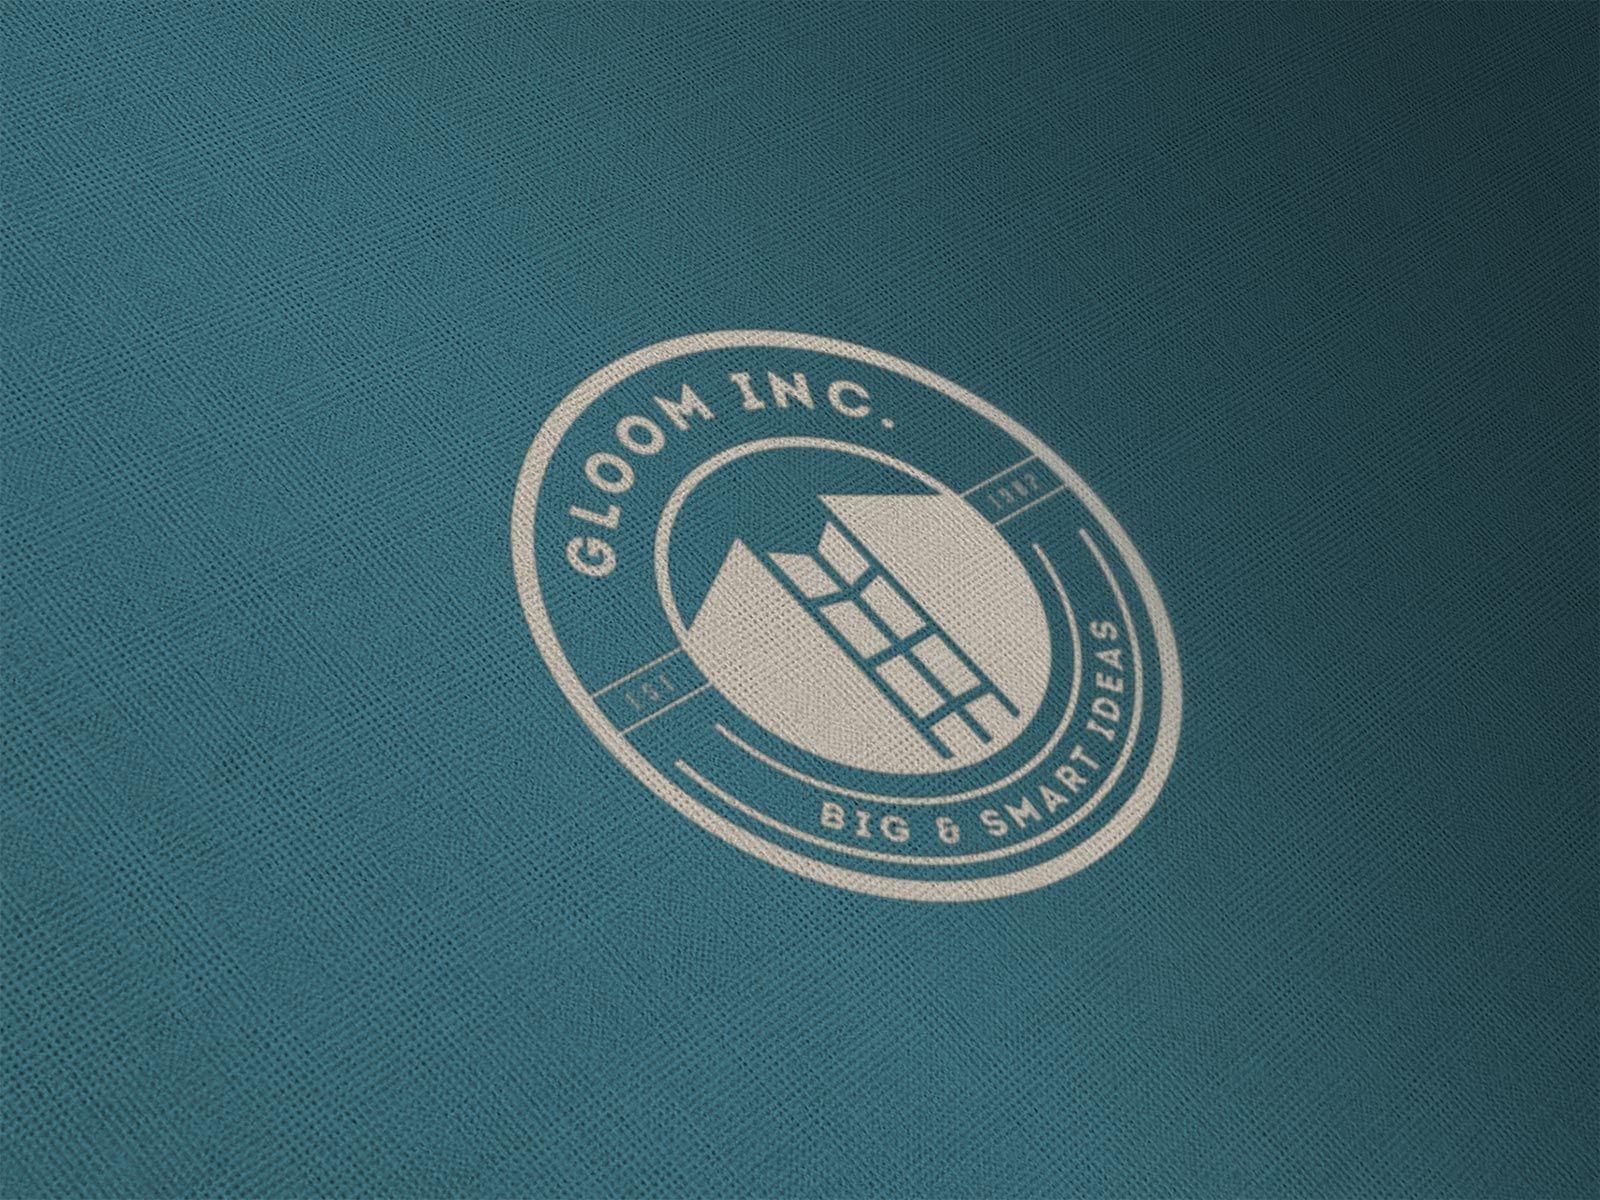 Download Free Burlap Fabric Cloth Logo Mockup Psd Apemockups Logo Mockup Logo Mockups Psd Free Logo Mockup Psd